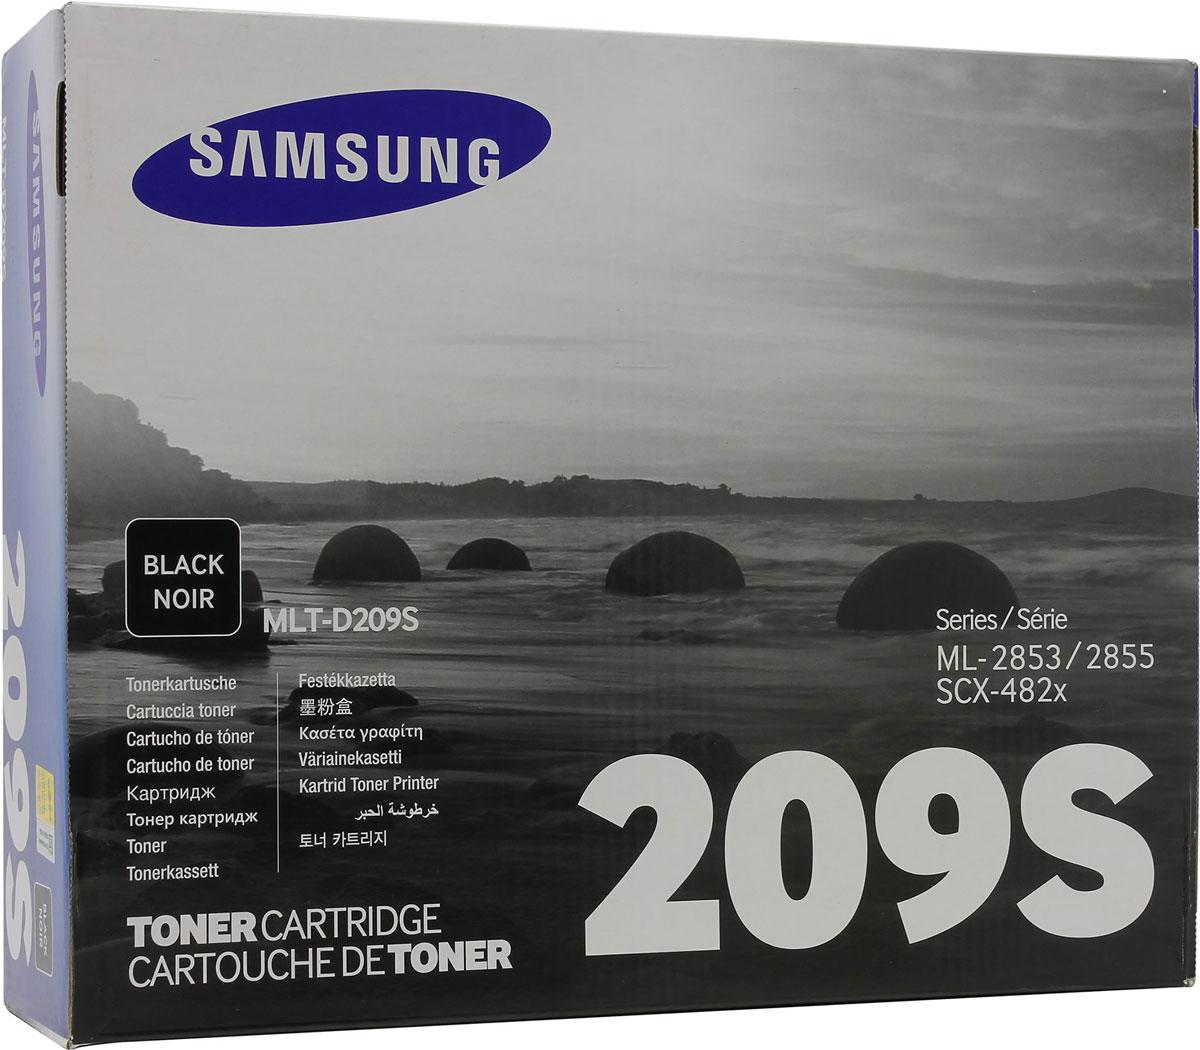 Samsung MLT-D209S тонер картридж для SCX-4824FN/4828FN, Black